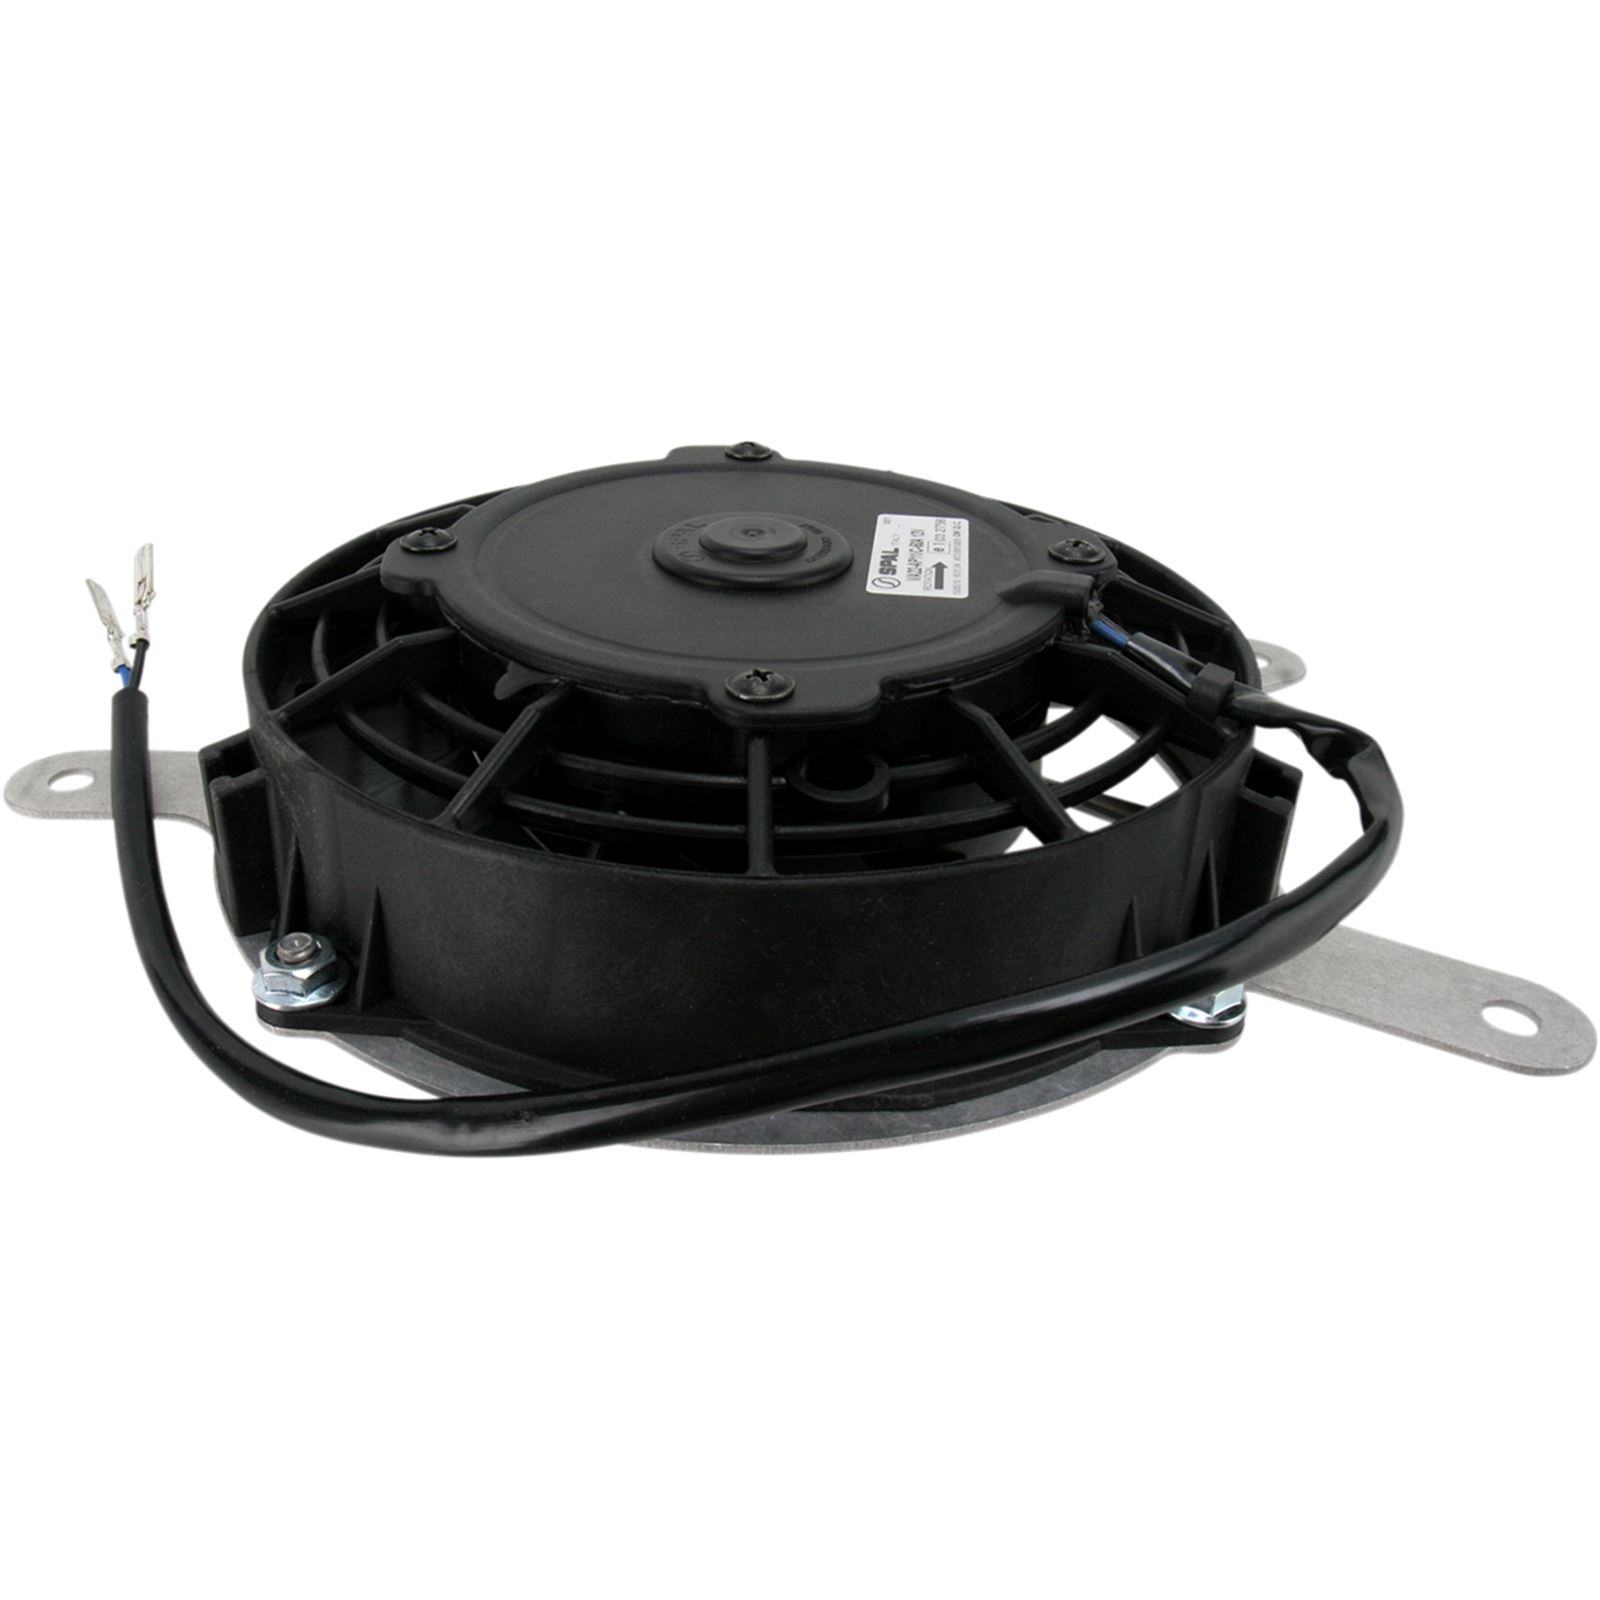 Moose Hi-Performance Cooling Fan - 330 CFM